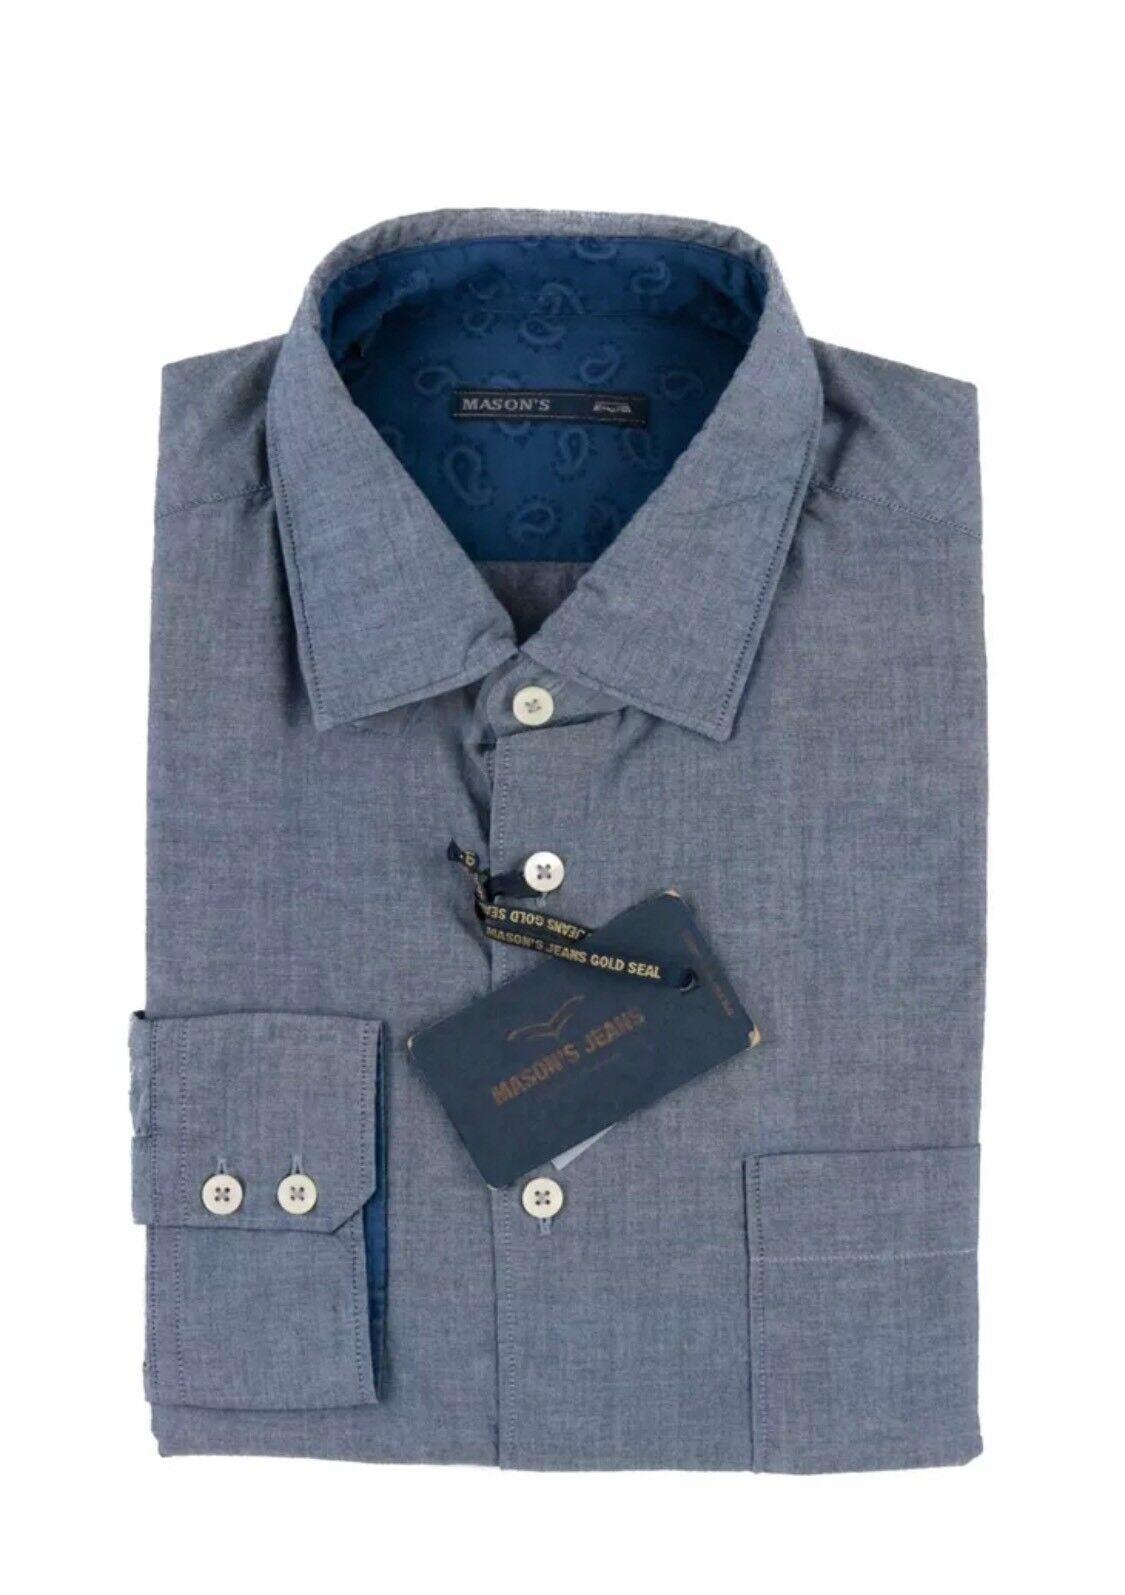 260 NWT MASONS JEANS Solid Blau Cotton Spread Collar Button-Up Dress Shirt 16 L